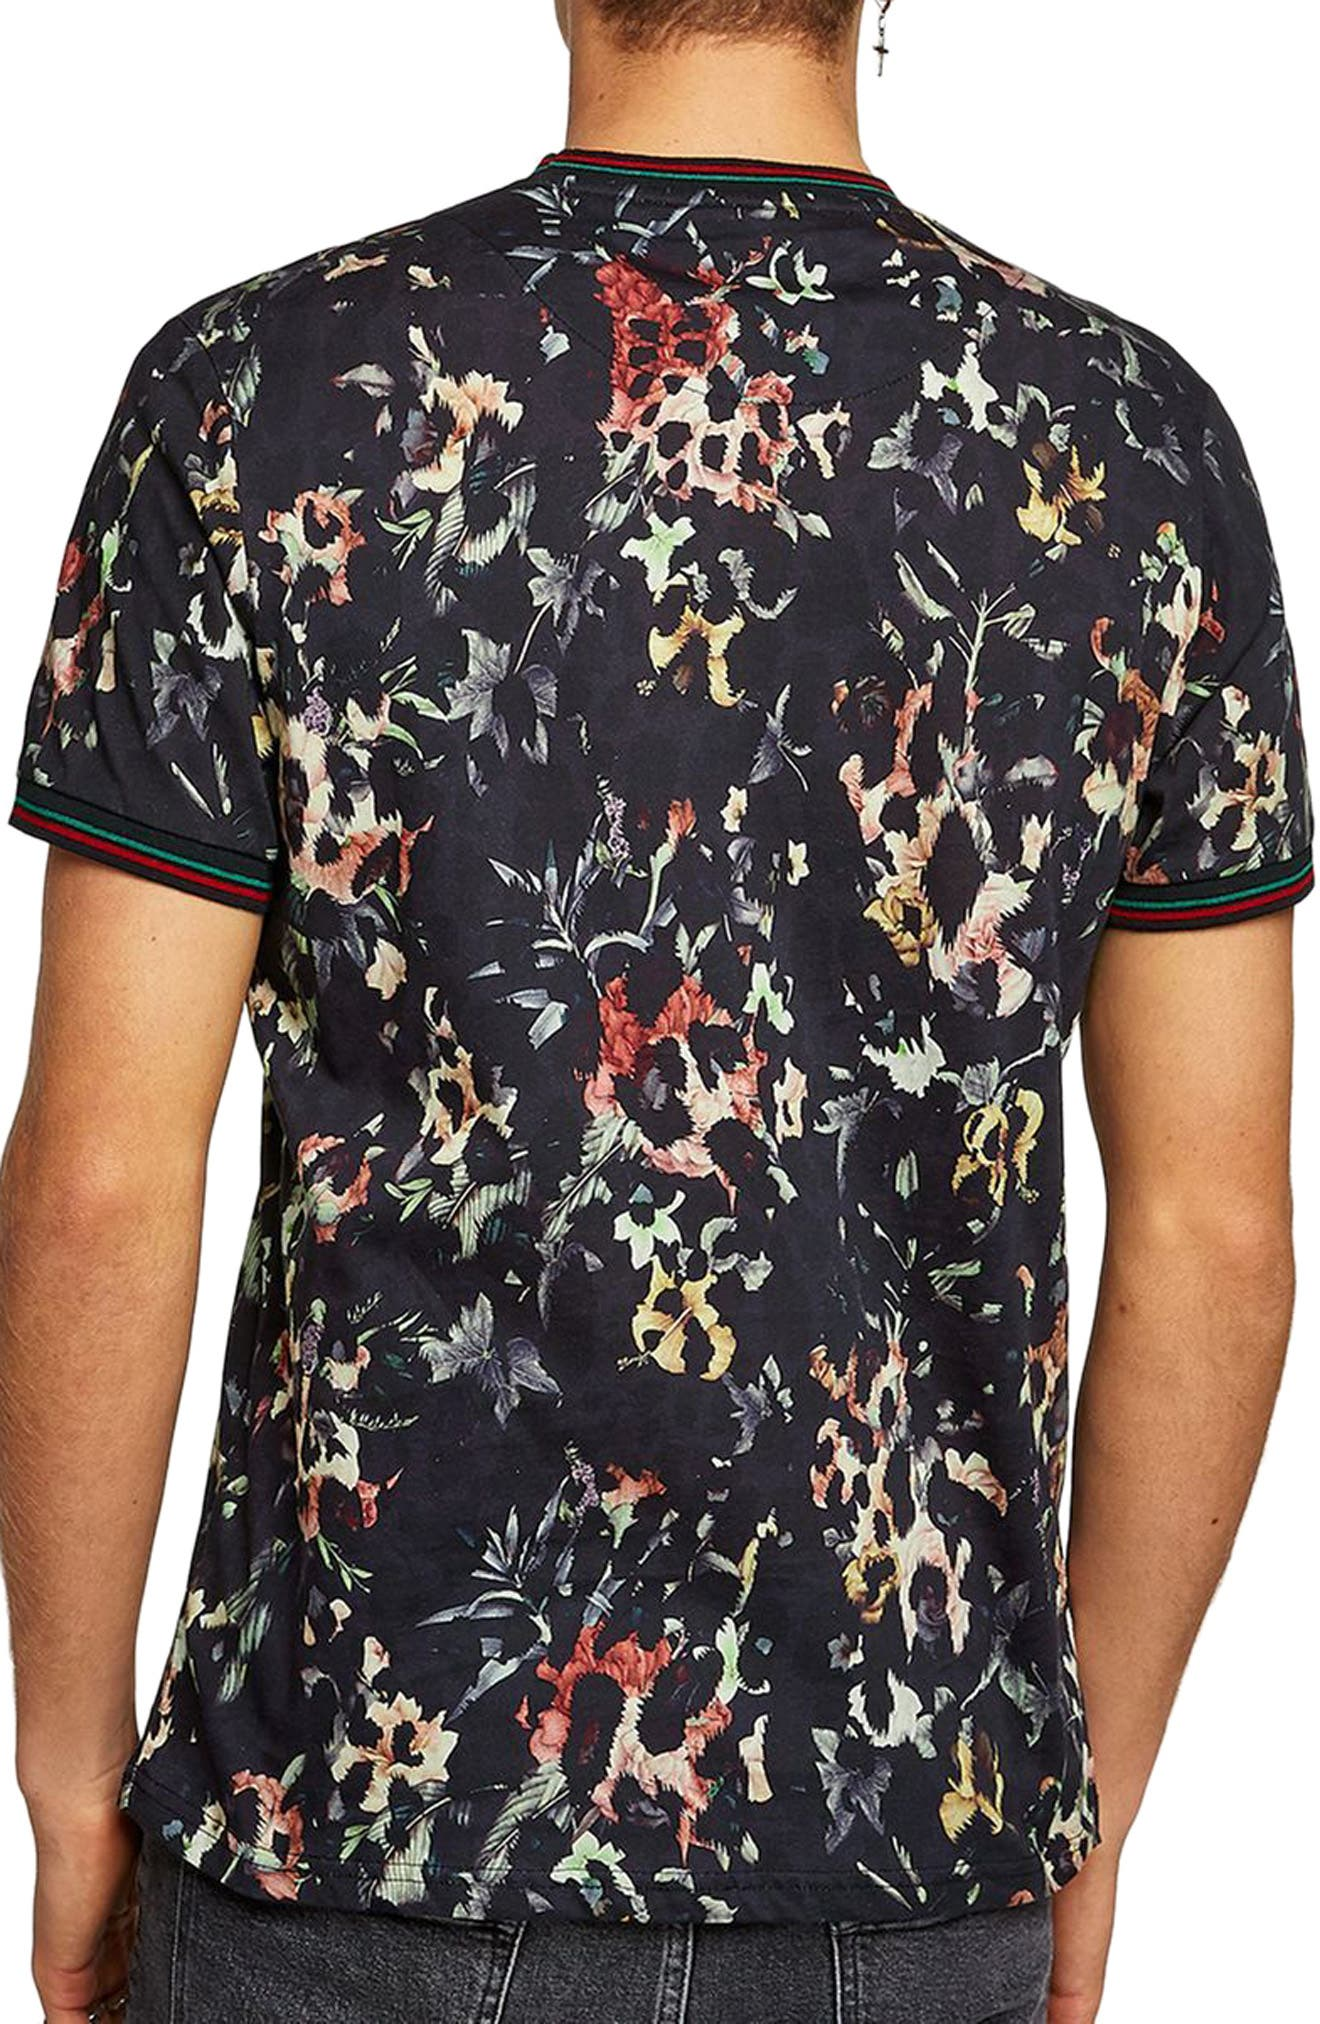 Floral Leopard Print T-Shirt,                             Alternate thumbnail 2, color,                             Black Multi